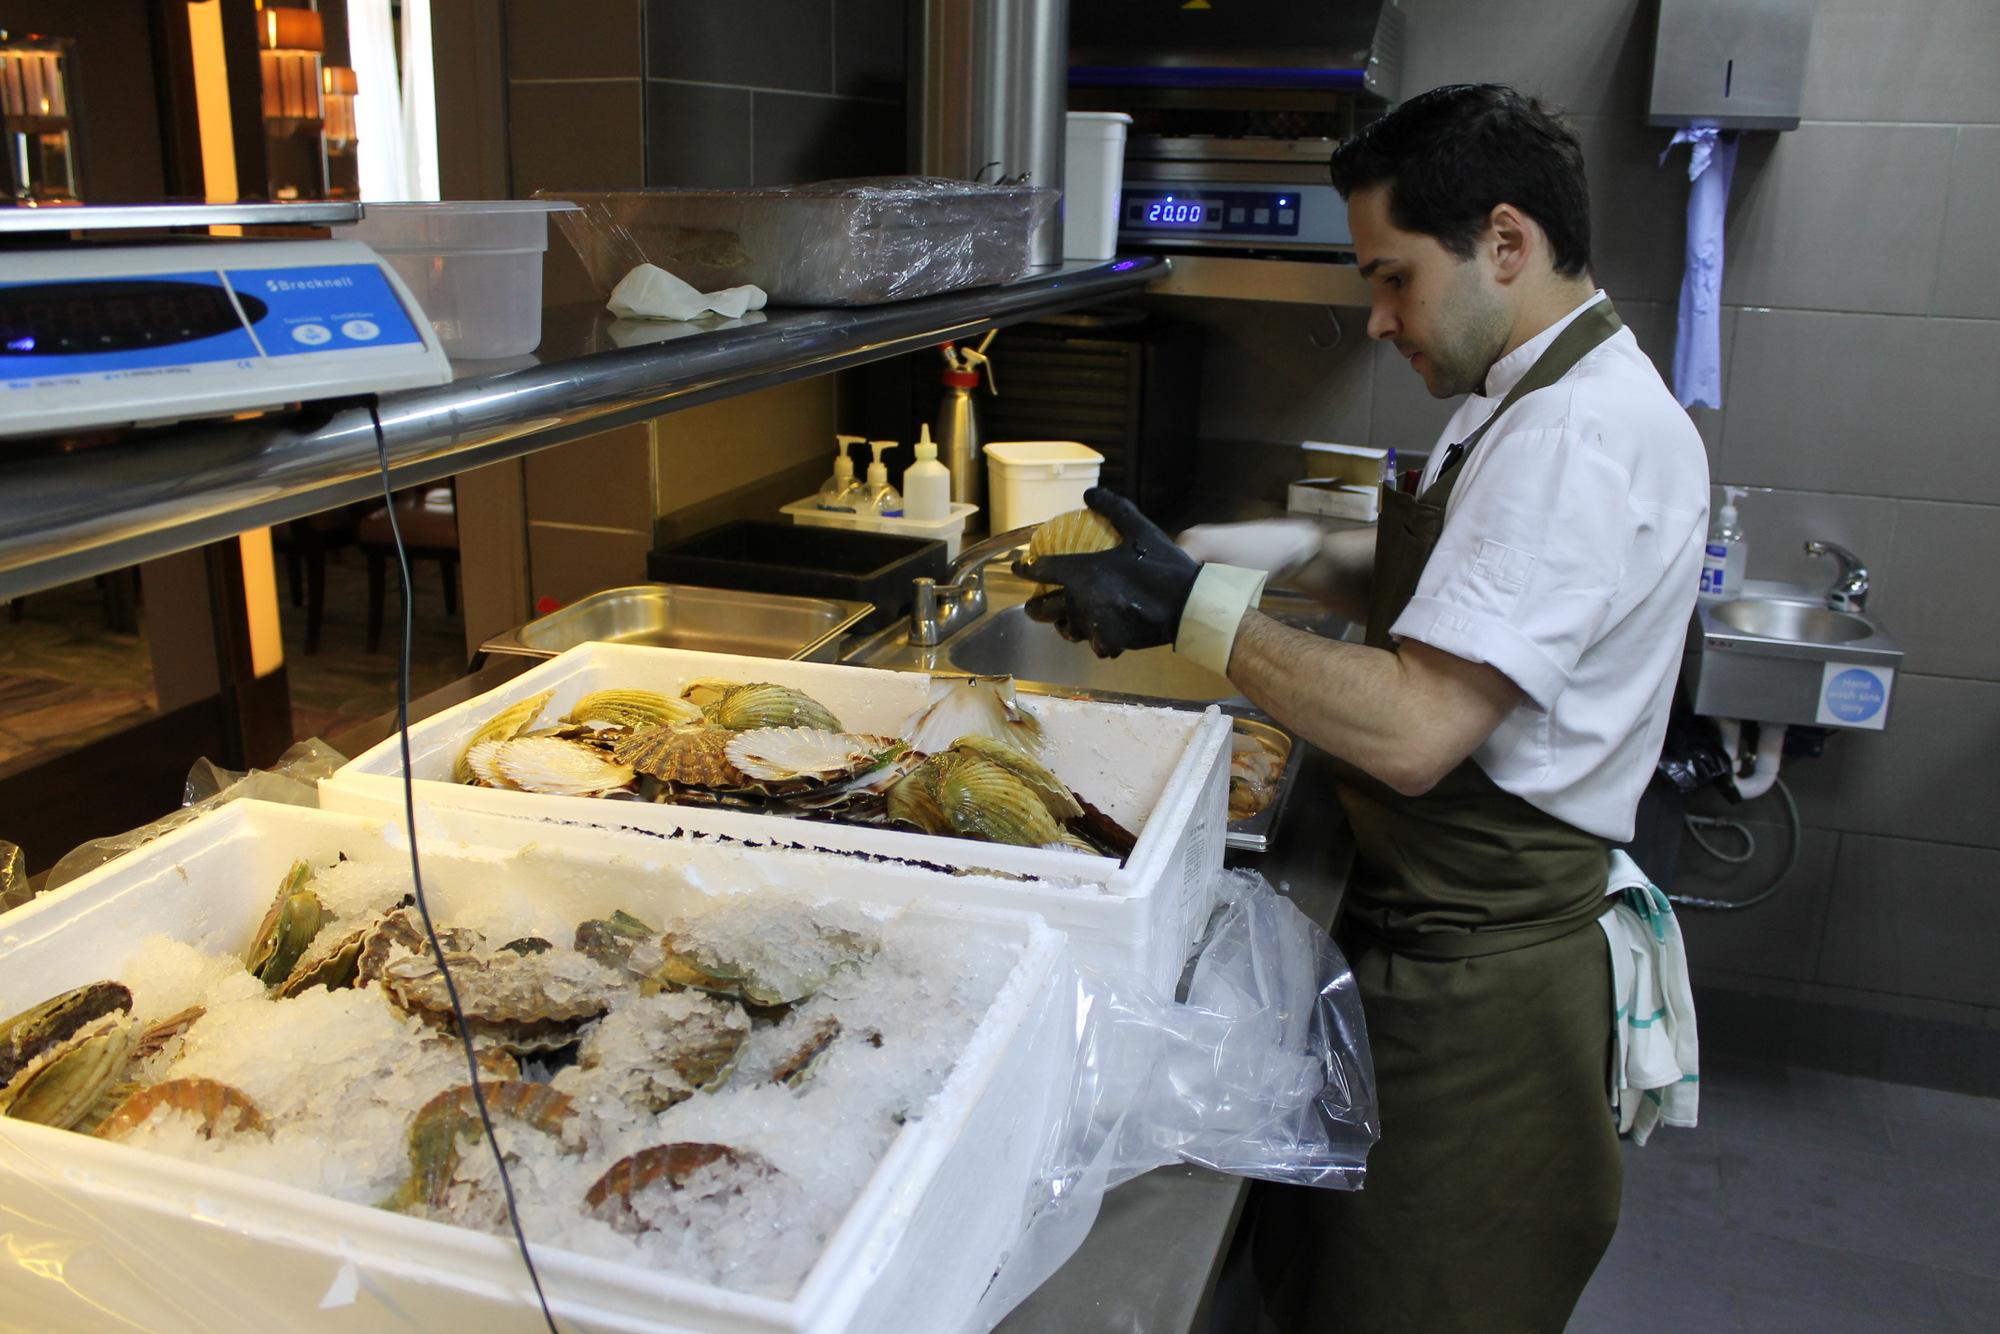 rafael shucking away with scallops